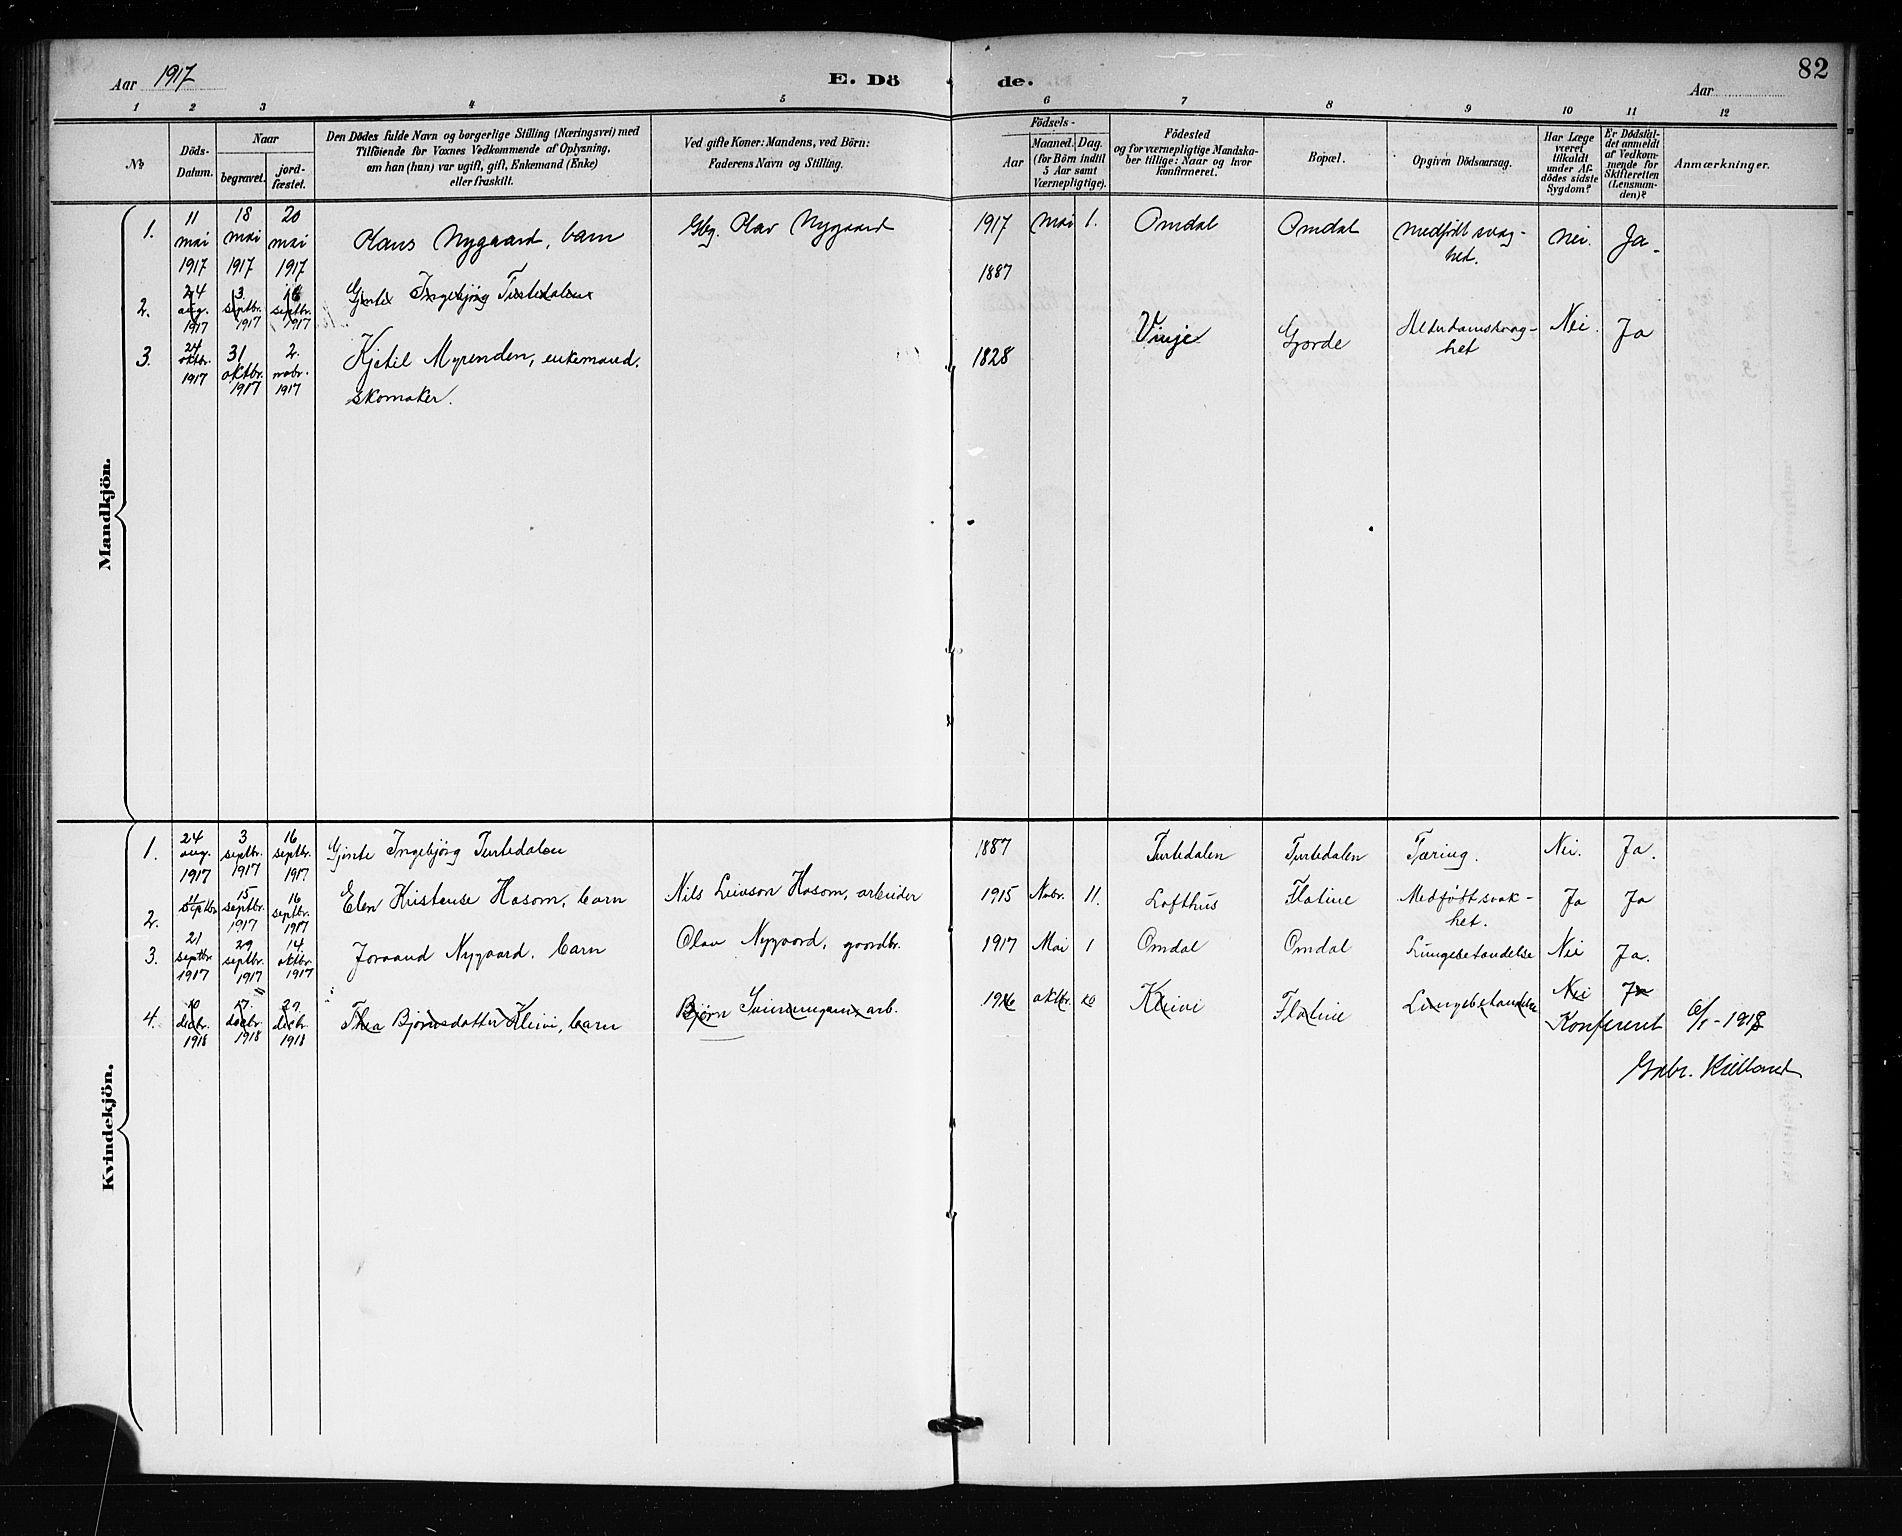 SAKO, Lårdal kirkebøker, G/Gb/L0003: Klokkerbok nr. II 3, 1889-1920, s. 82